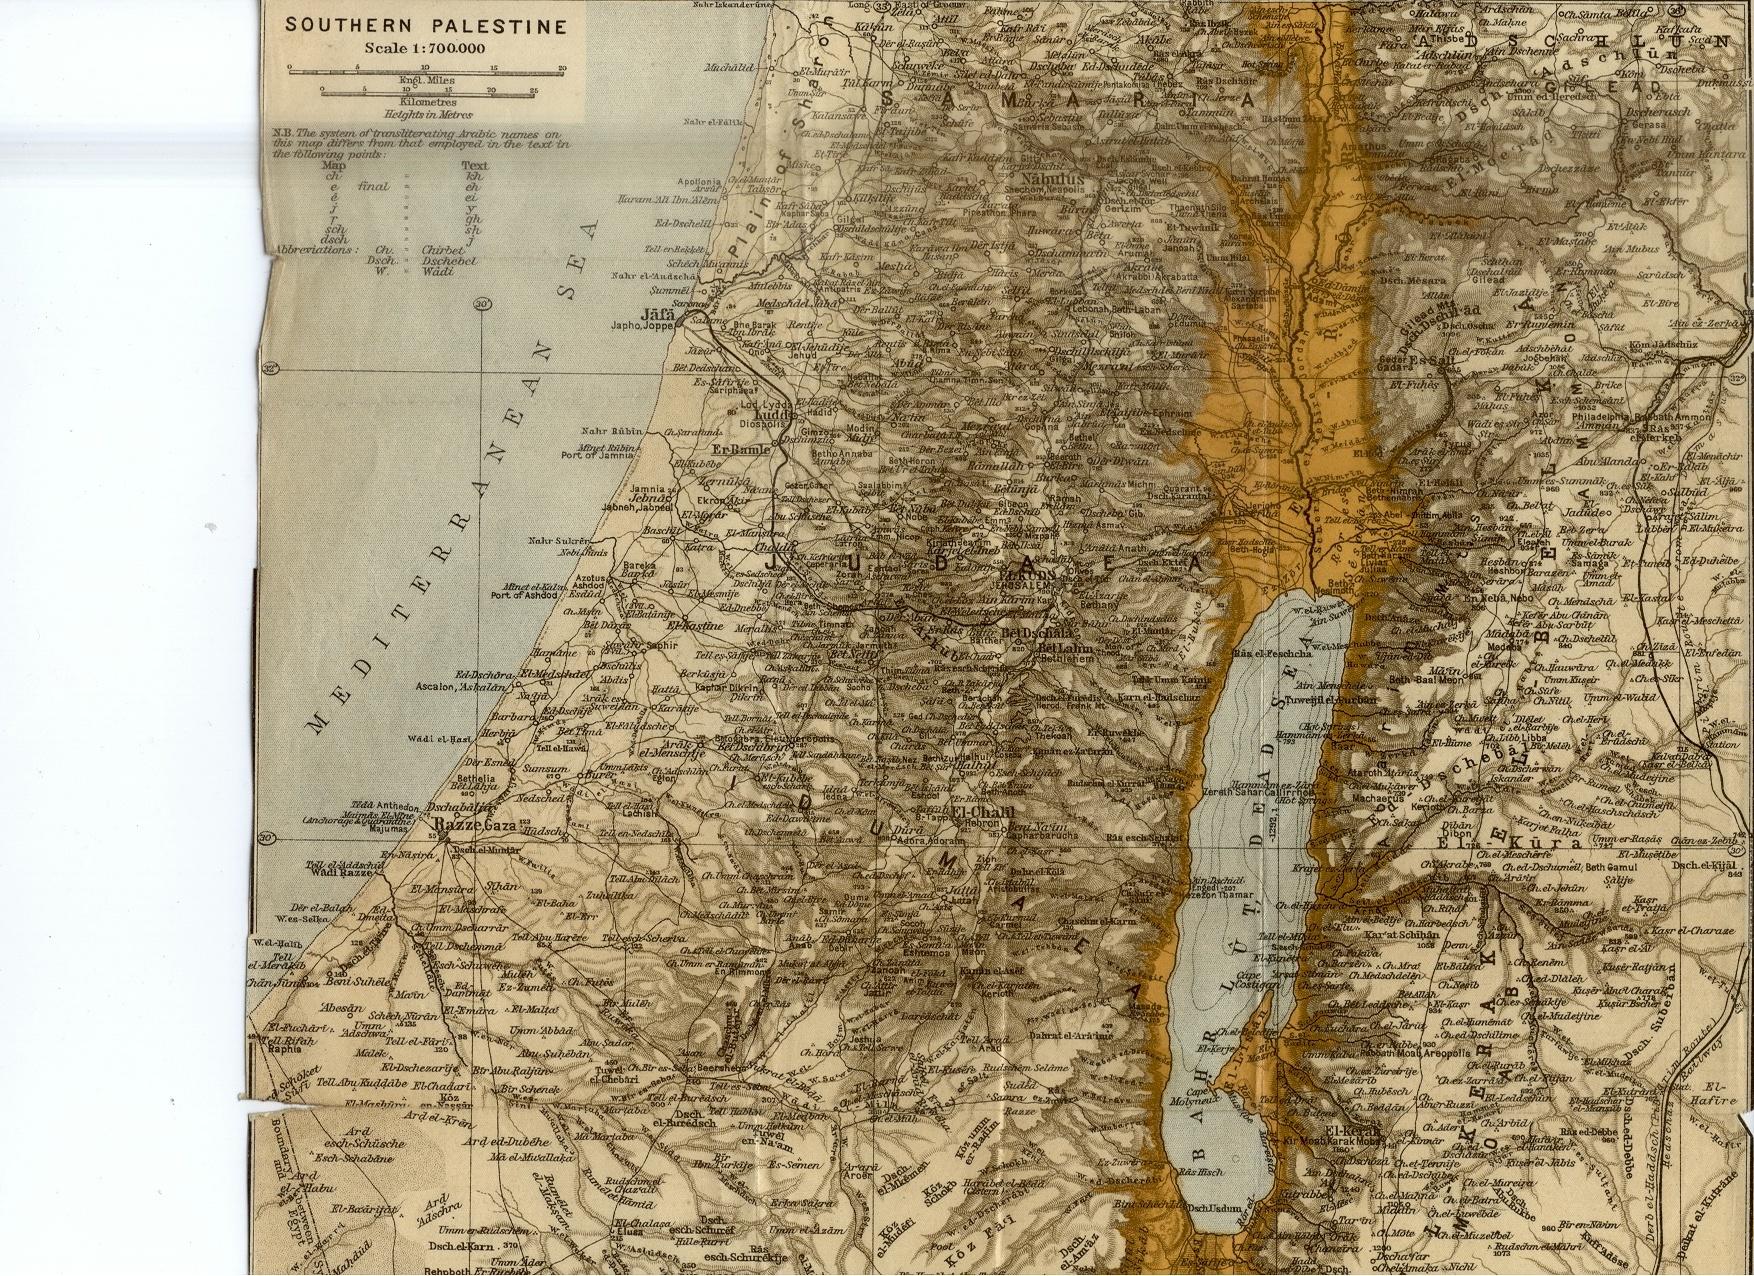 Southern Palestine Map